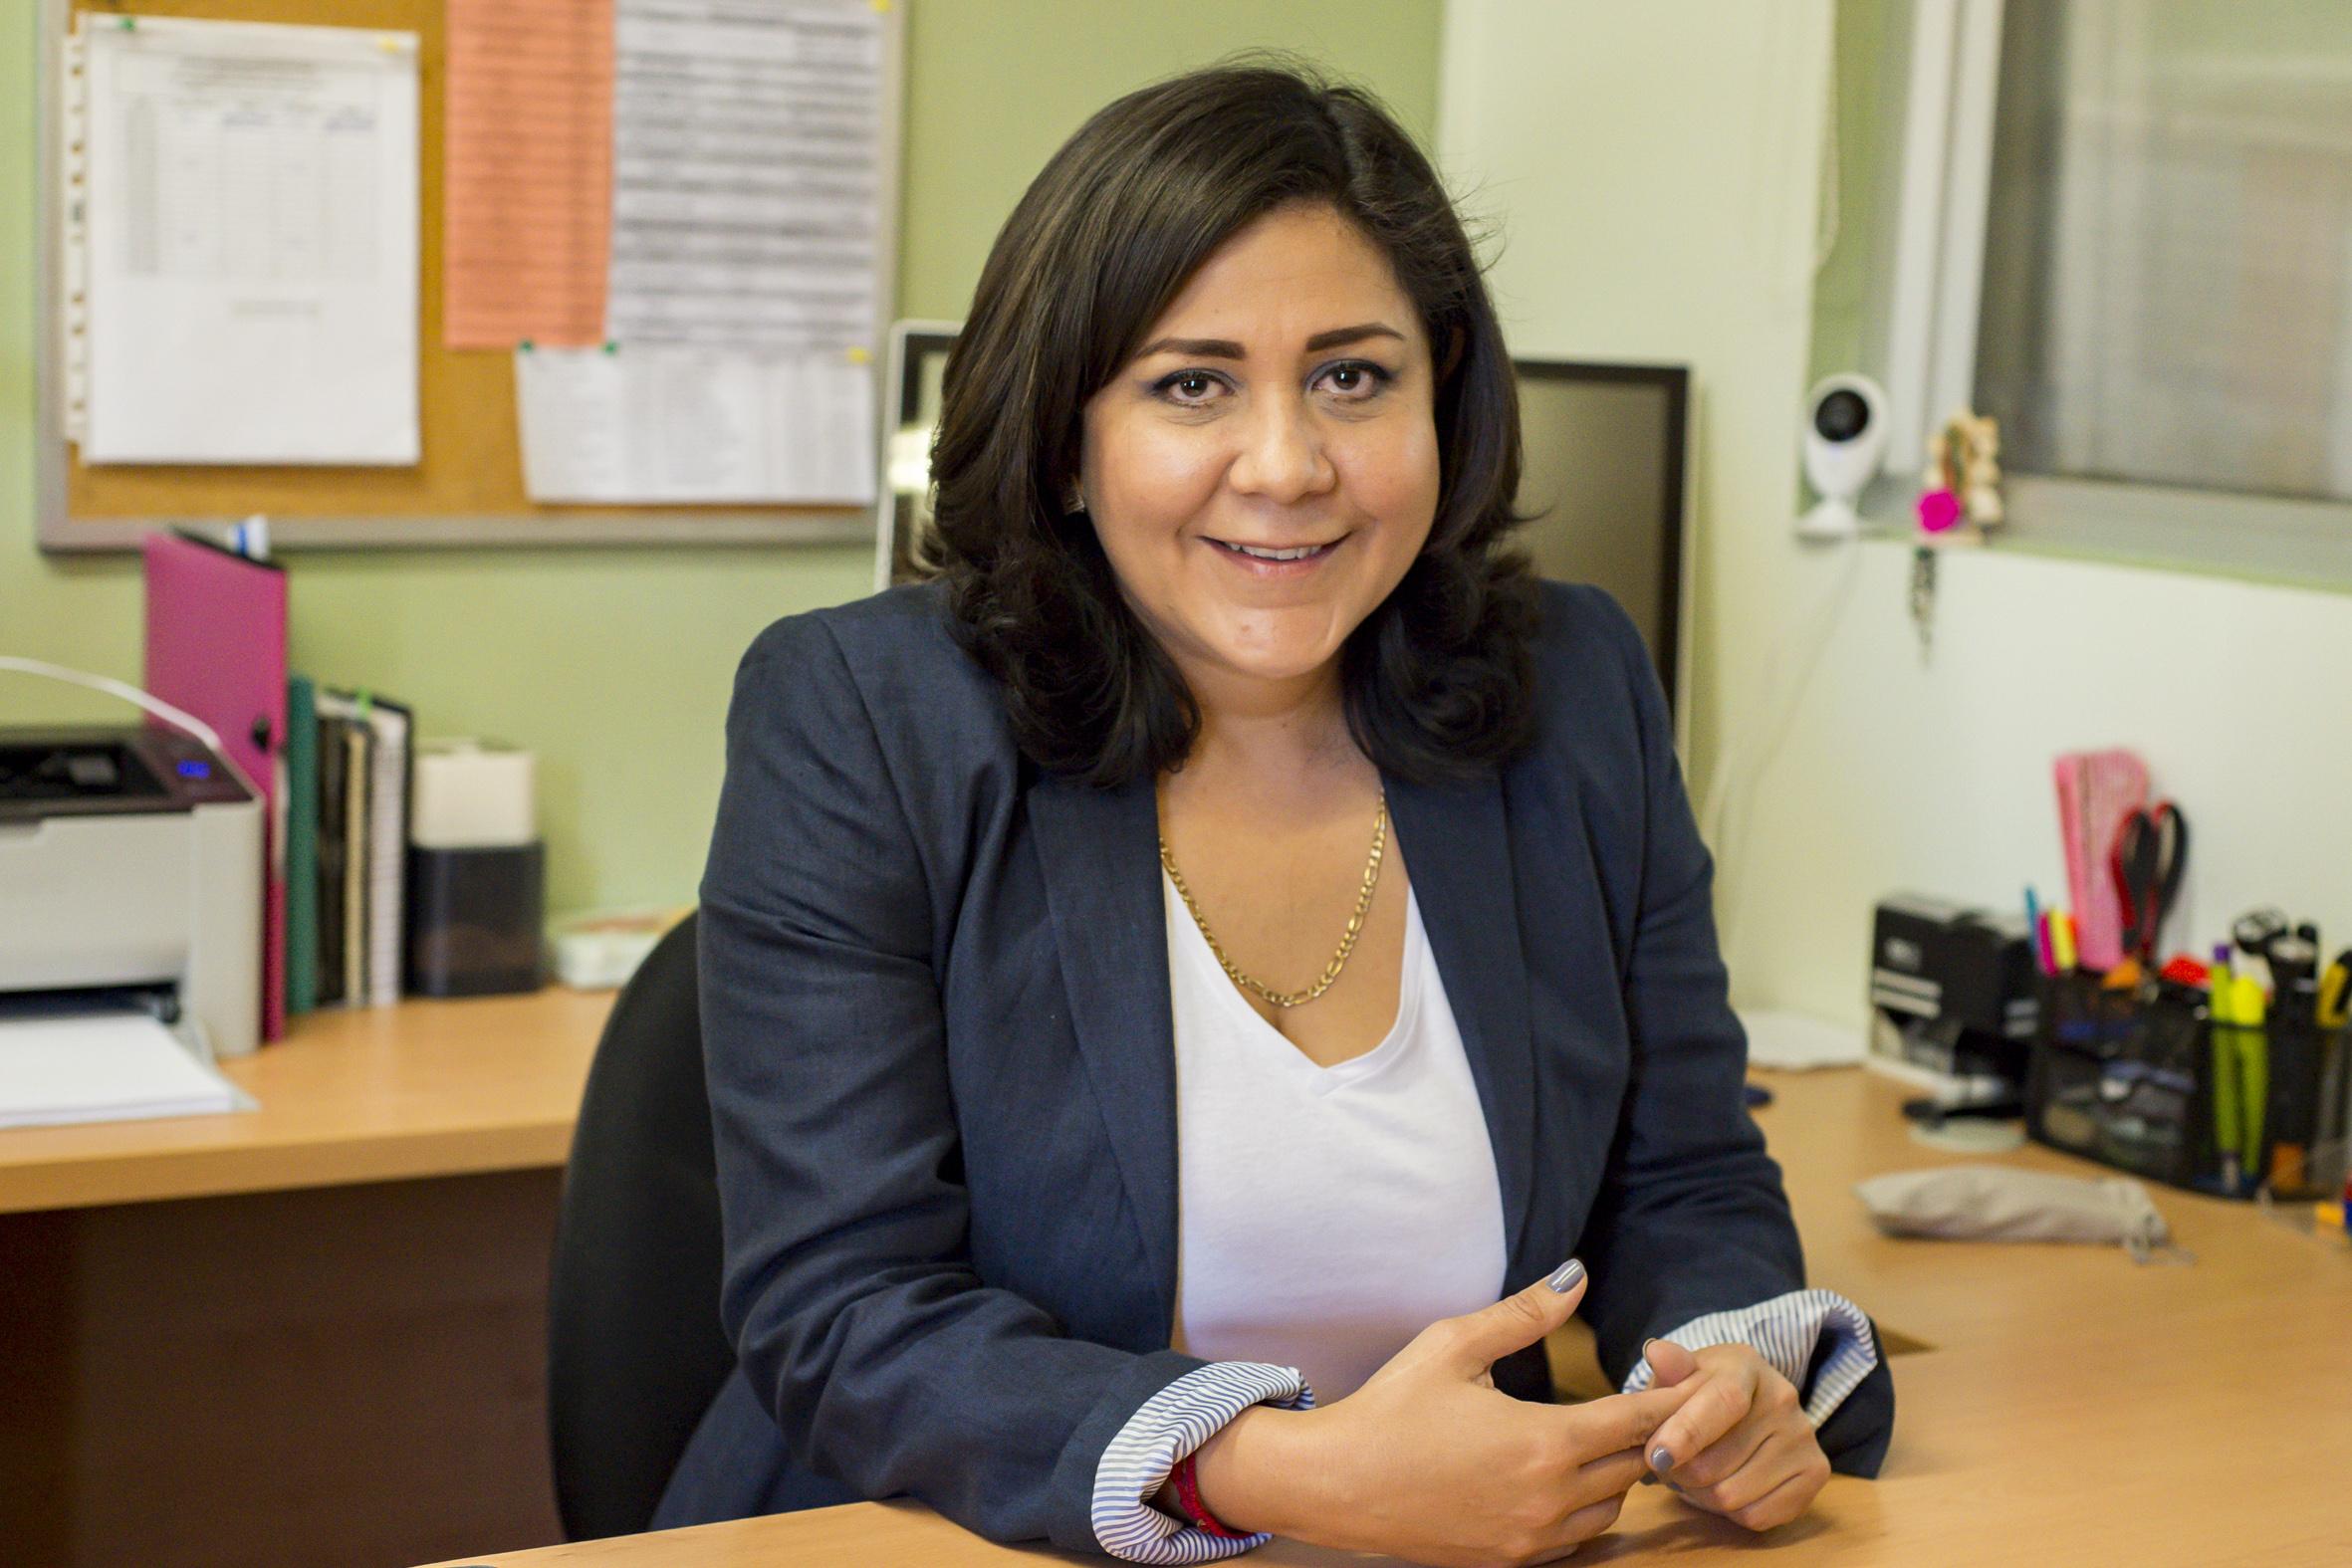 Licenciada Hilda Silvia Beatriz Orozco Anzo